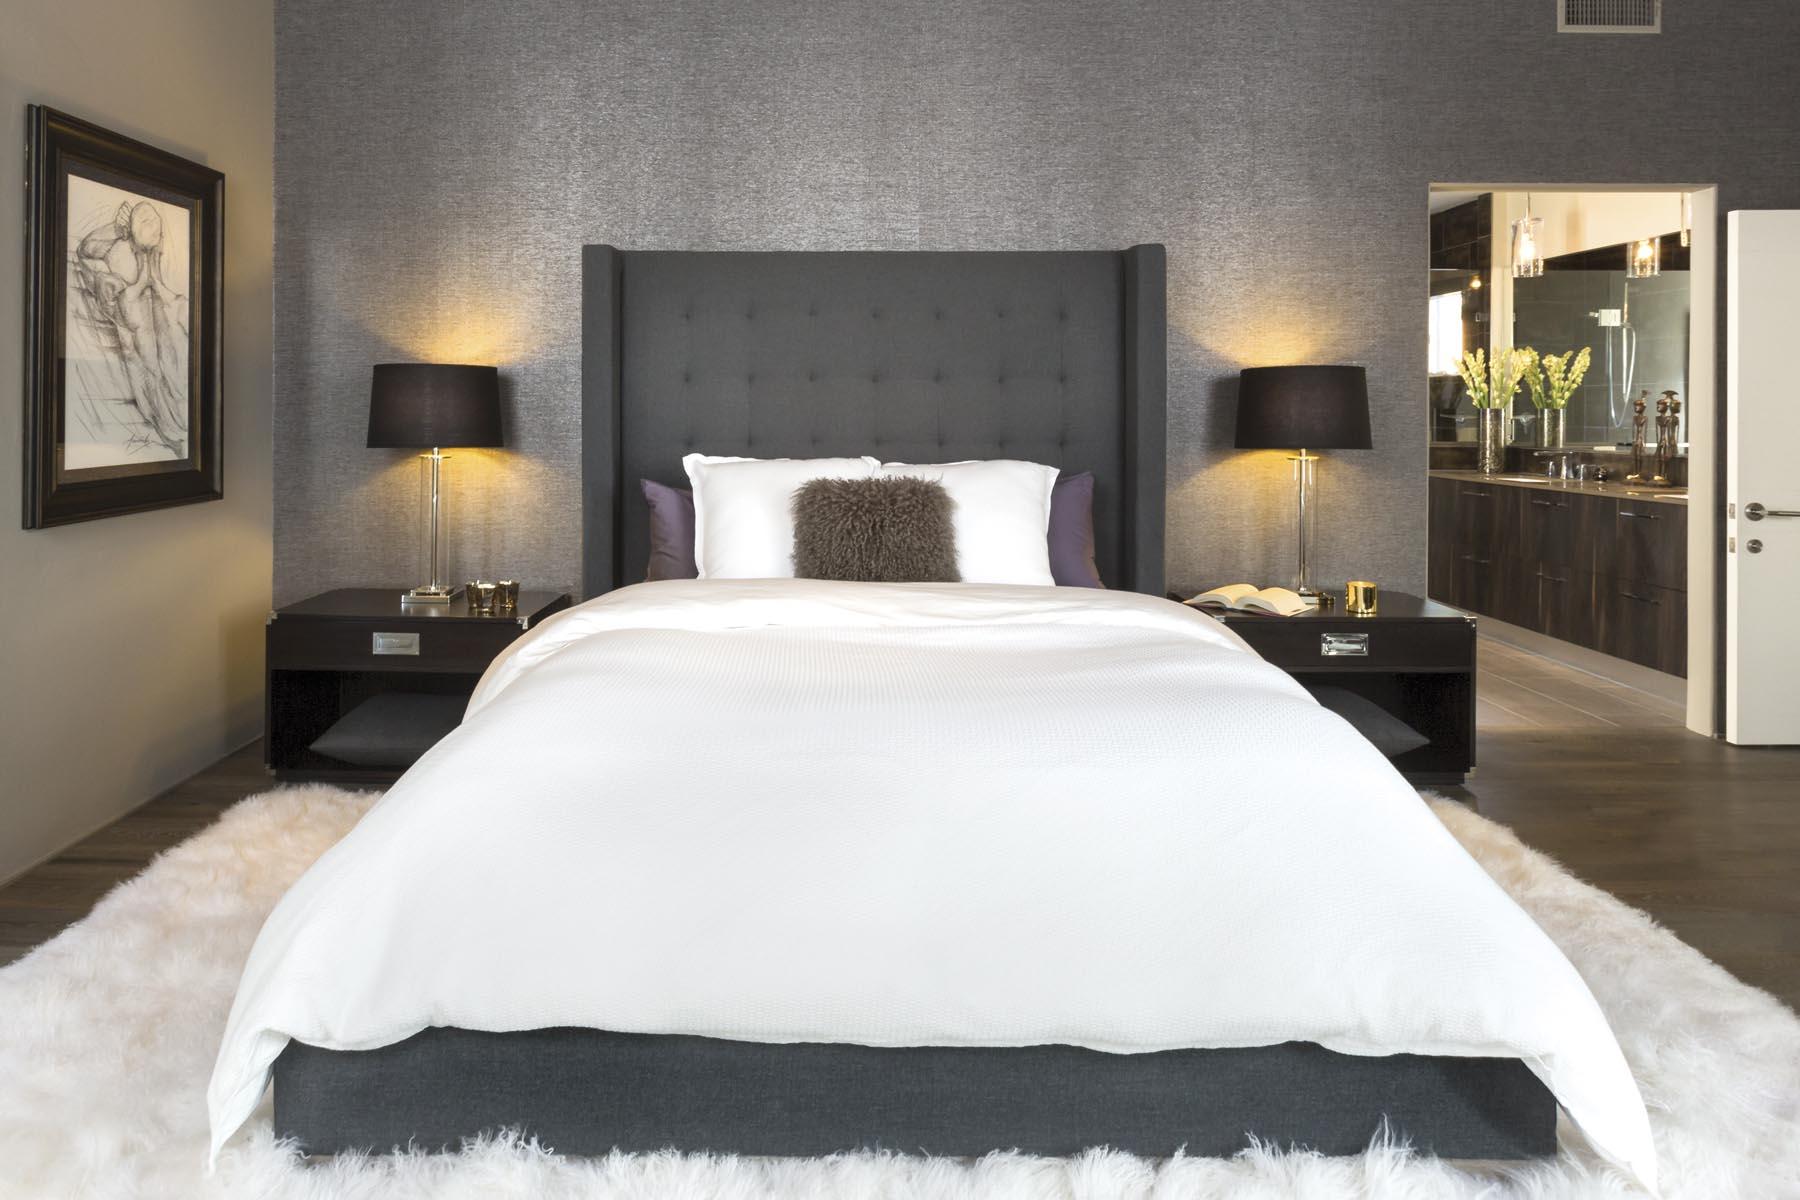 Fleischer master bedroom